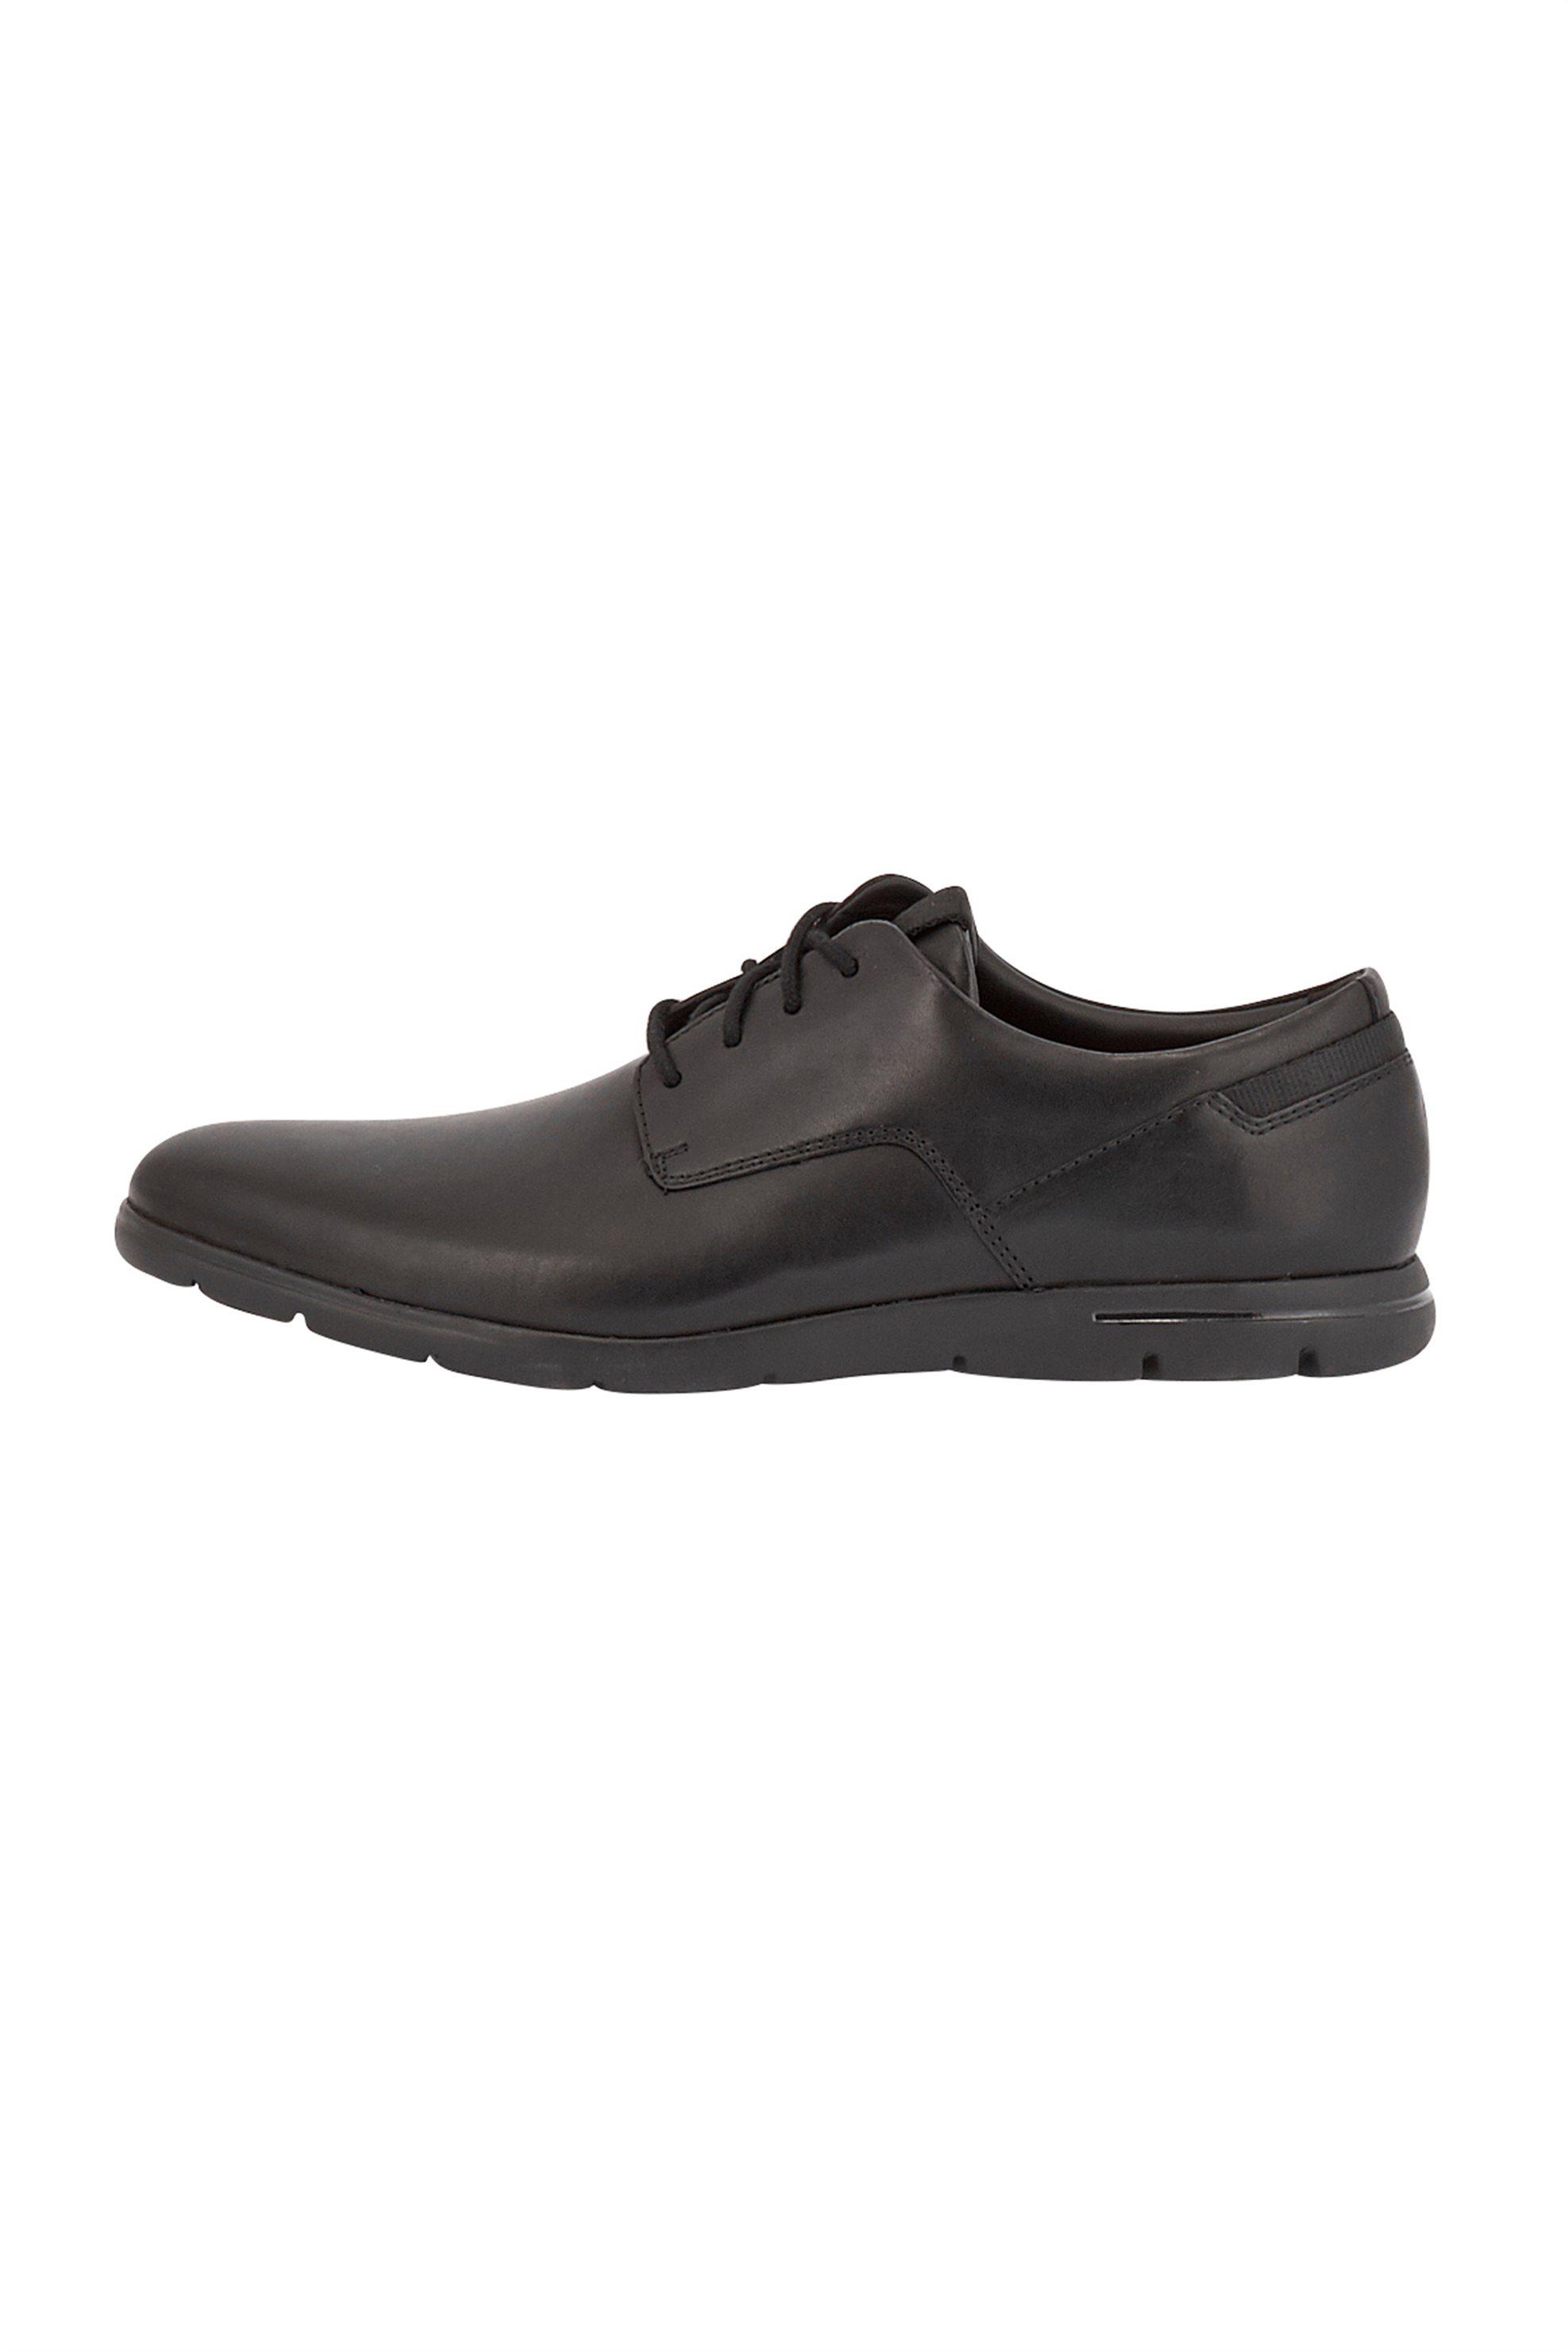 Clarks ανδρικά δερμάτινα παπούτσια oxford «Vennor Walk» – 26131748 – Μαύρο